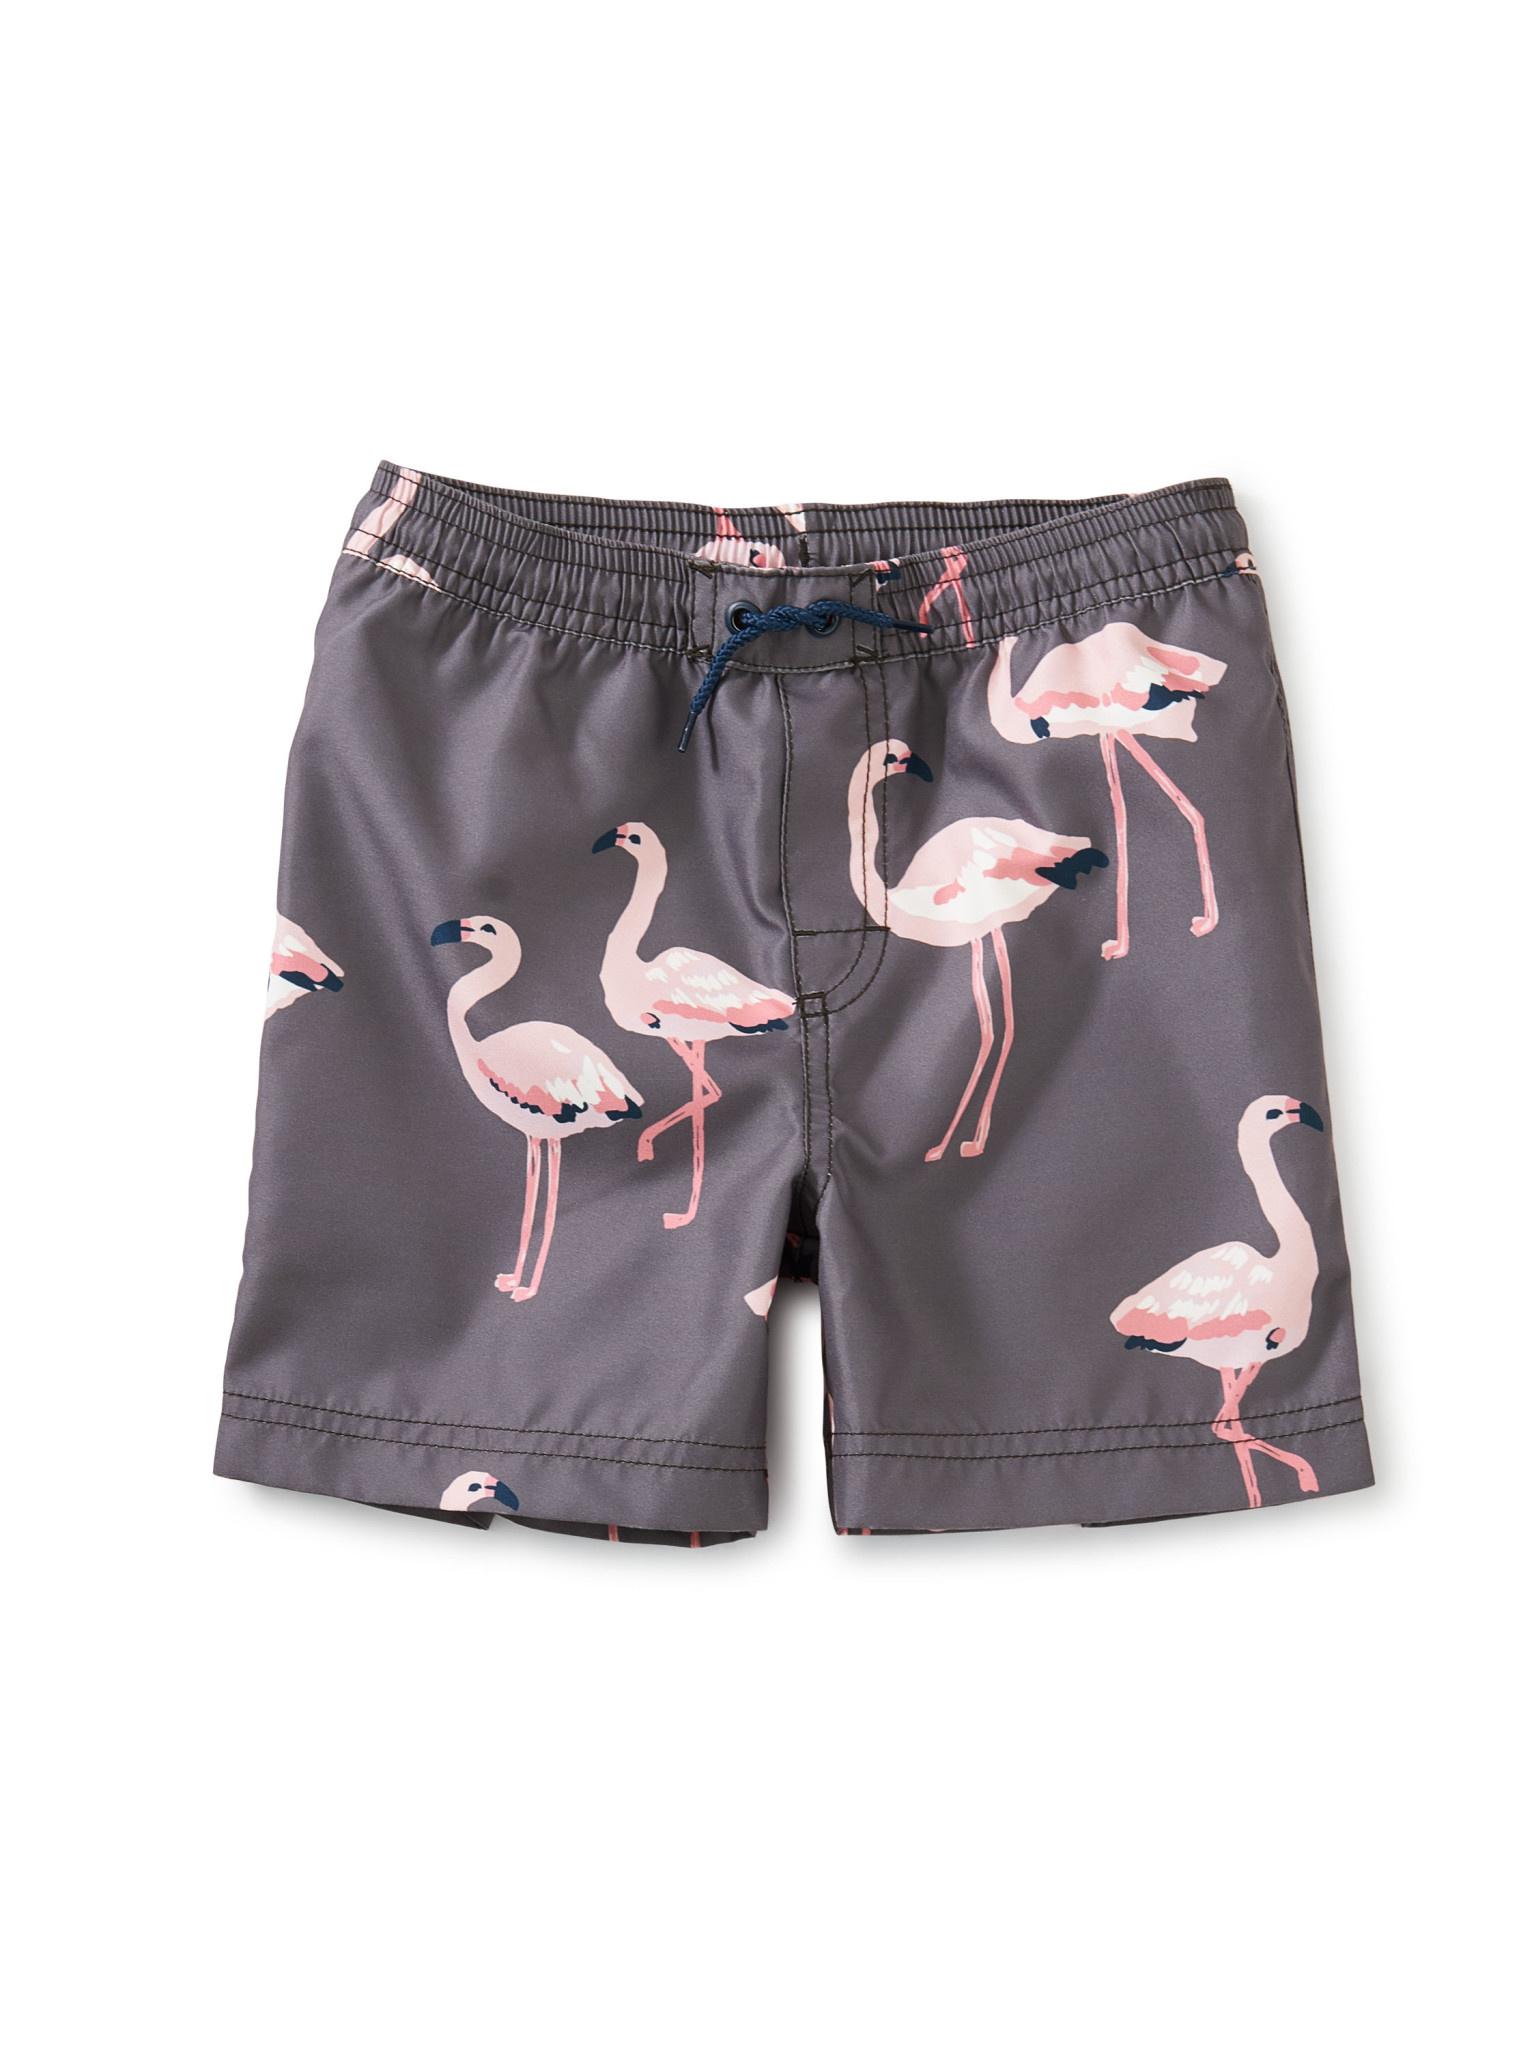 Tea Collection Mid-Length Swim Trunk- Flamingo